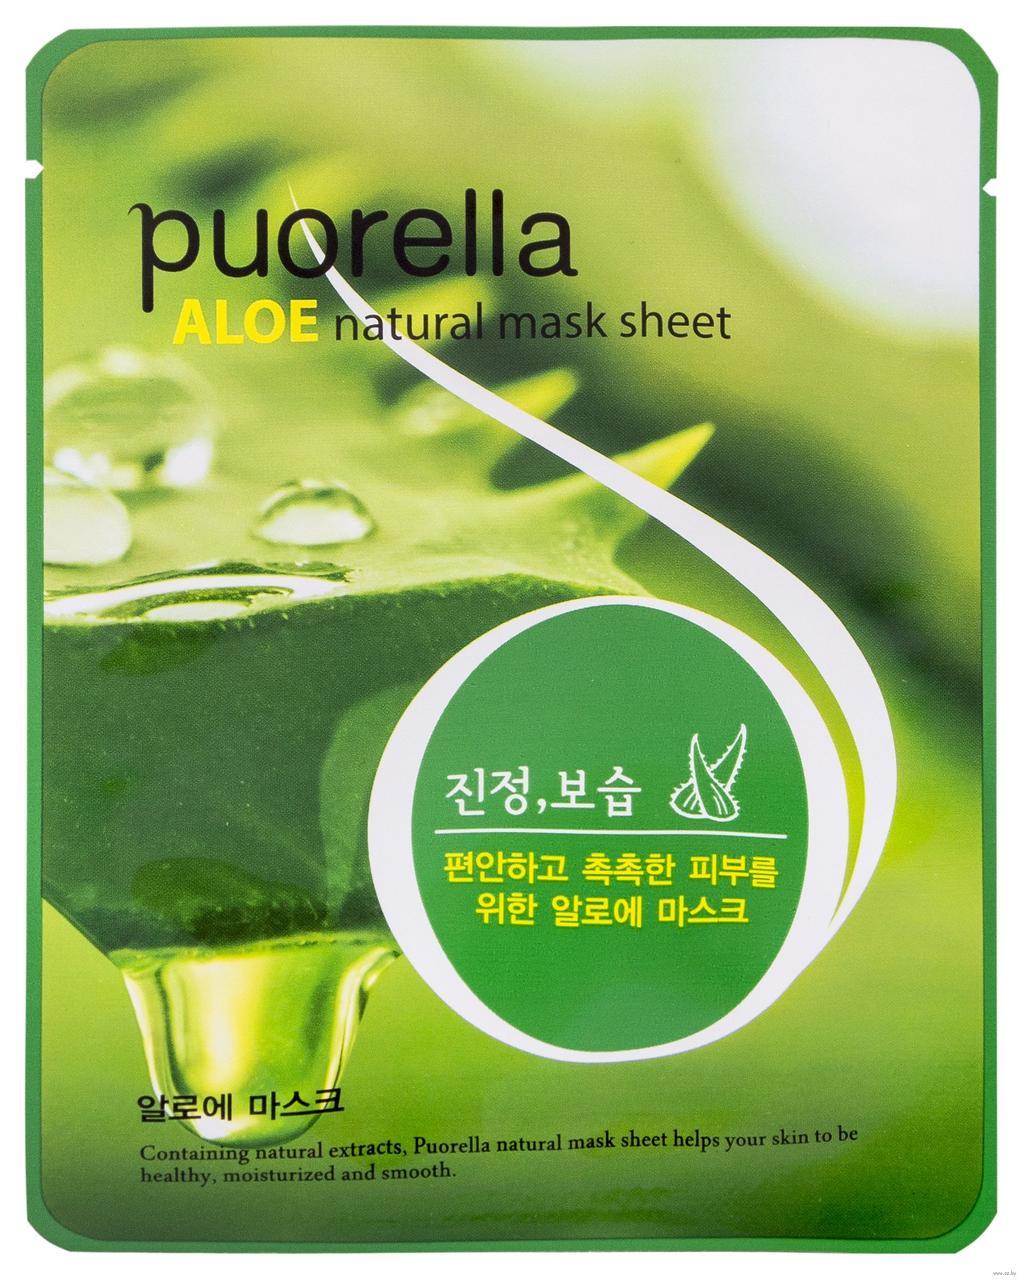 Тканевая маска для лица с алоэ Puorella Aloe Natural Mask Sheet